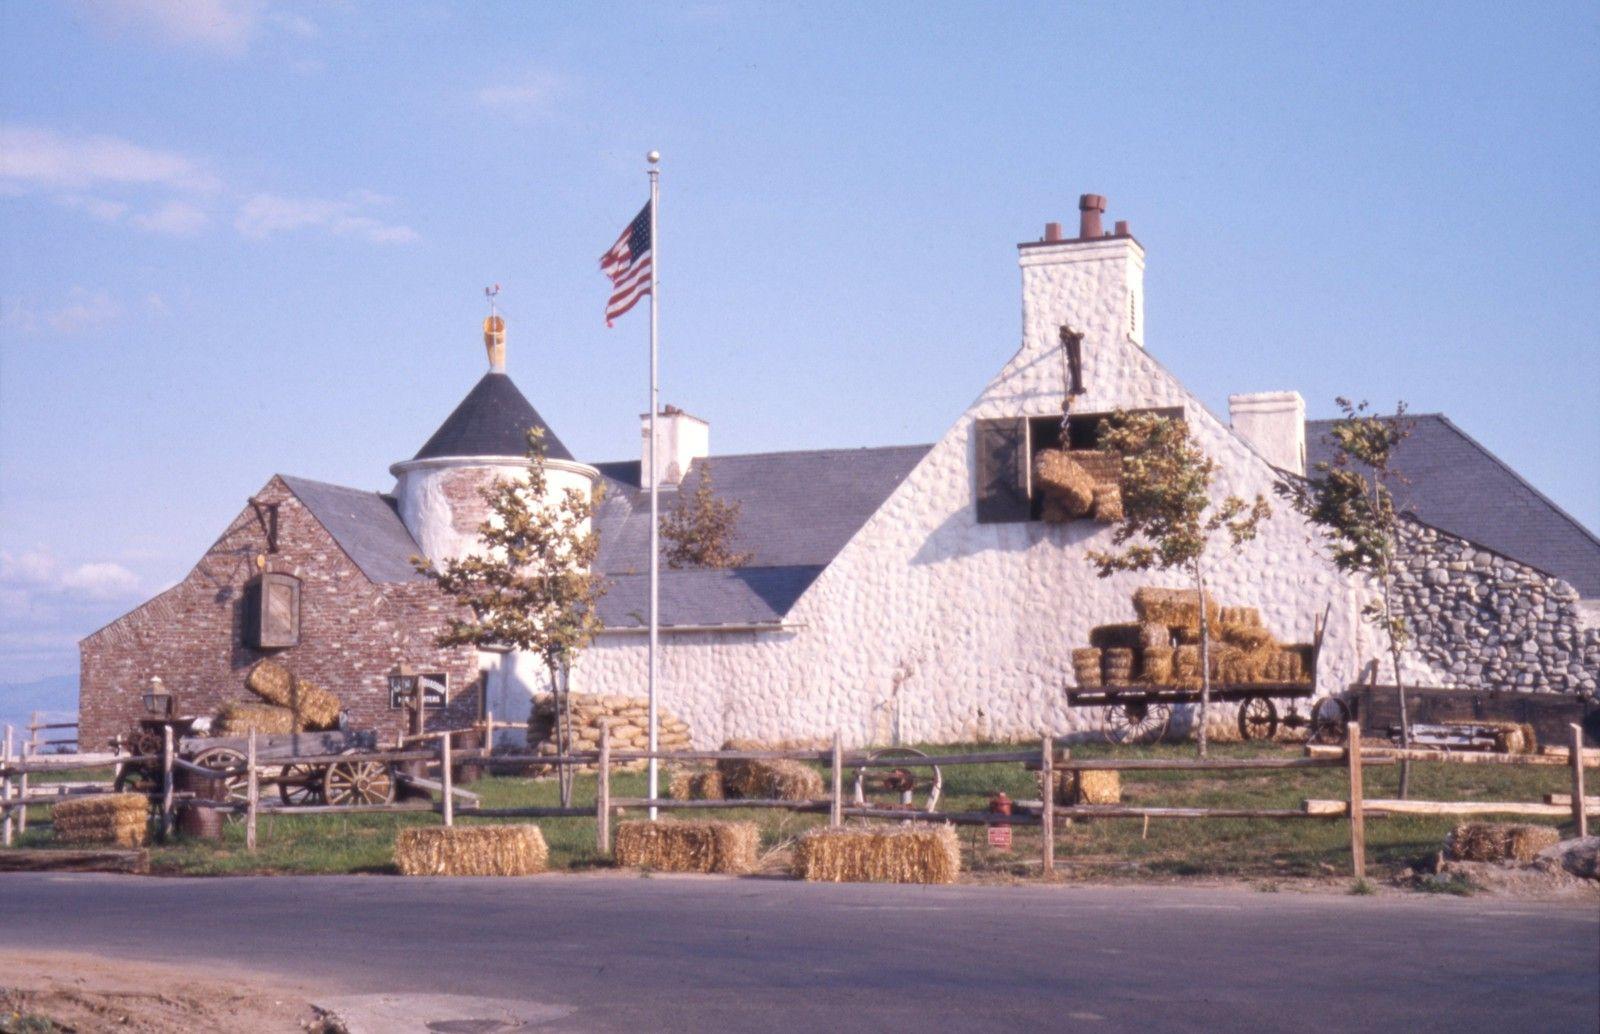 94th aero squadron restaurant orange county airport 1974